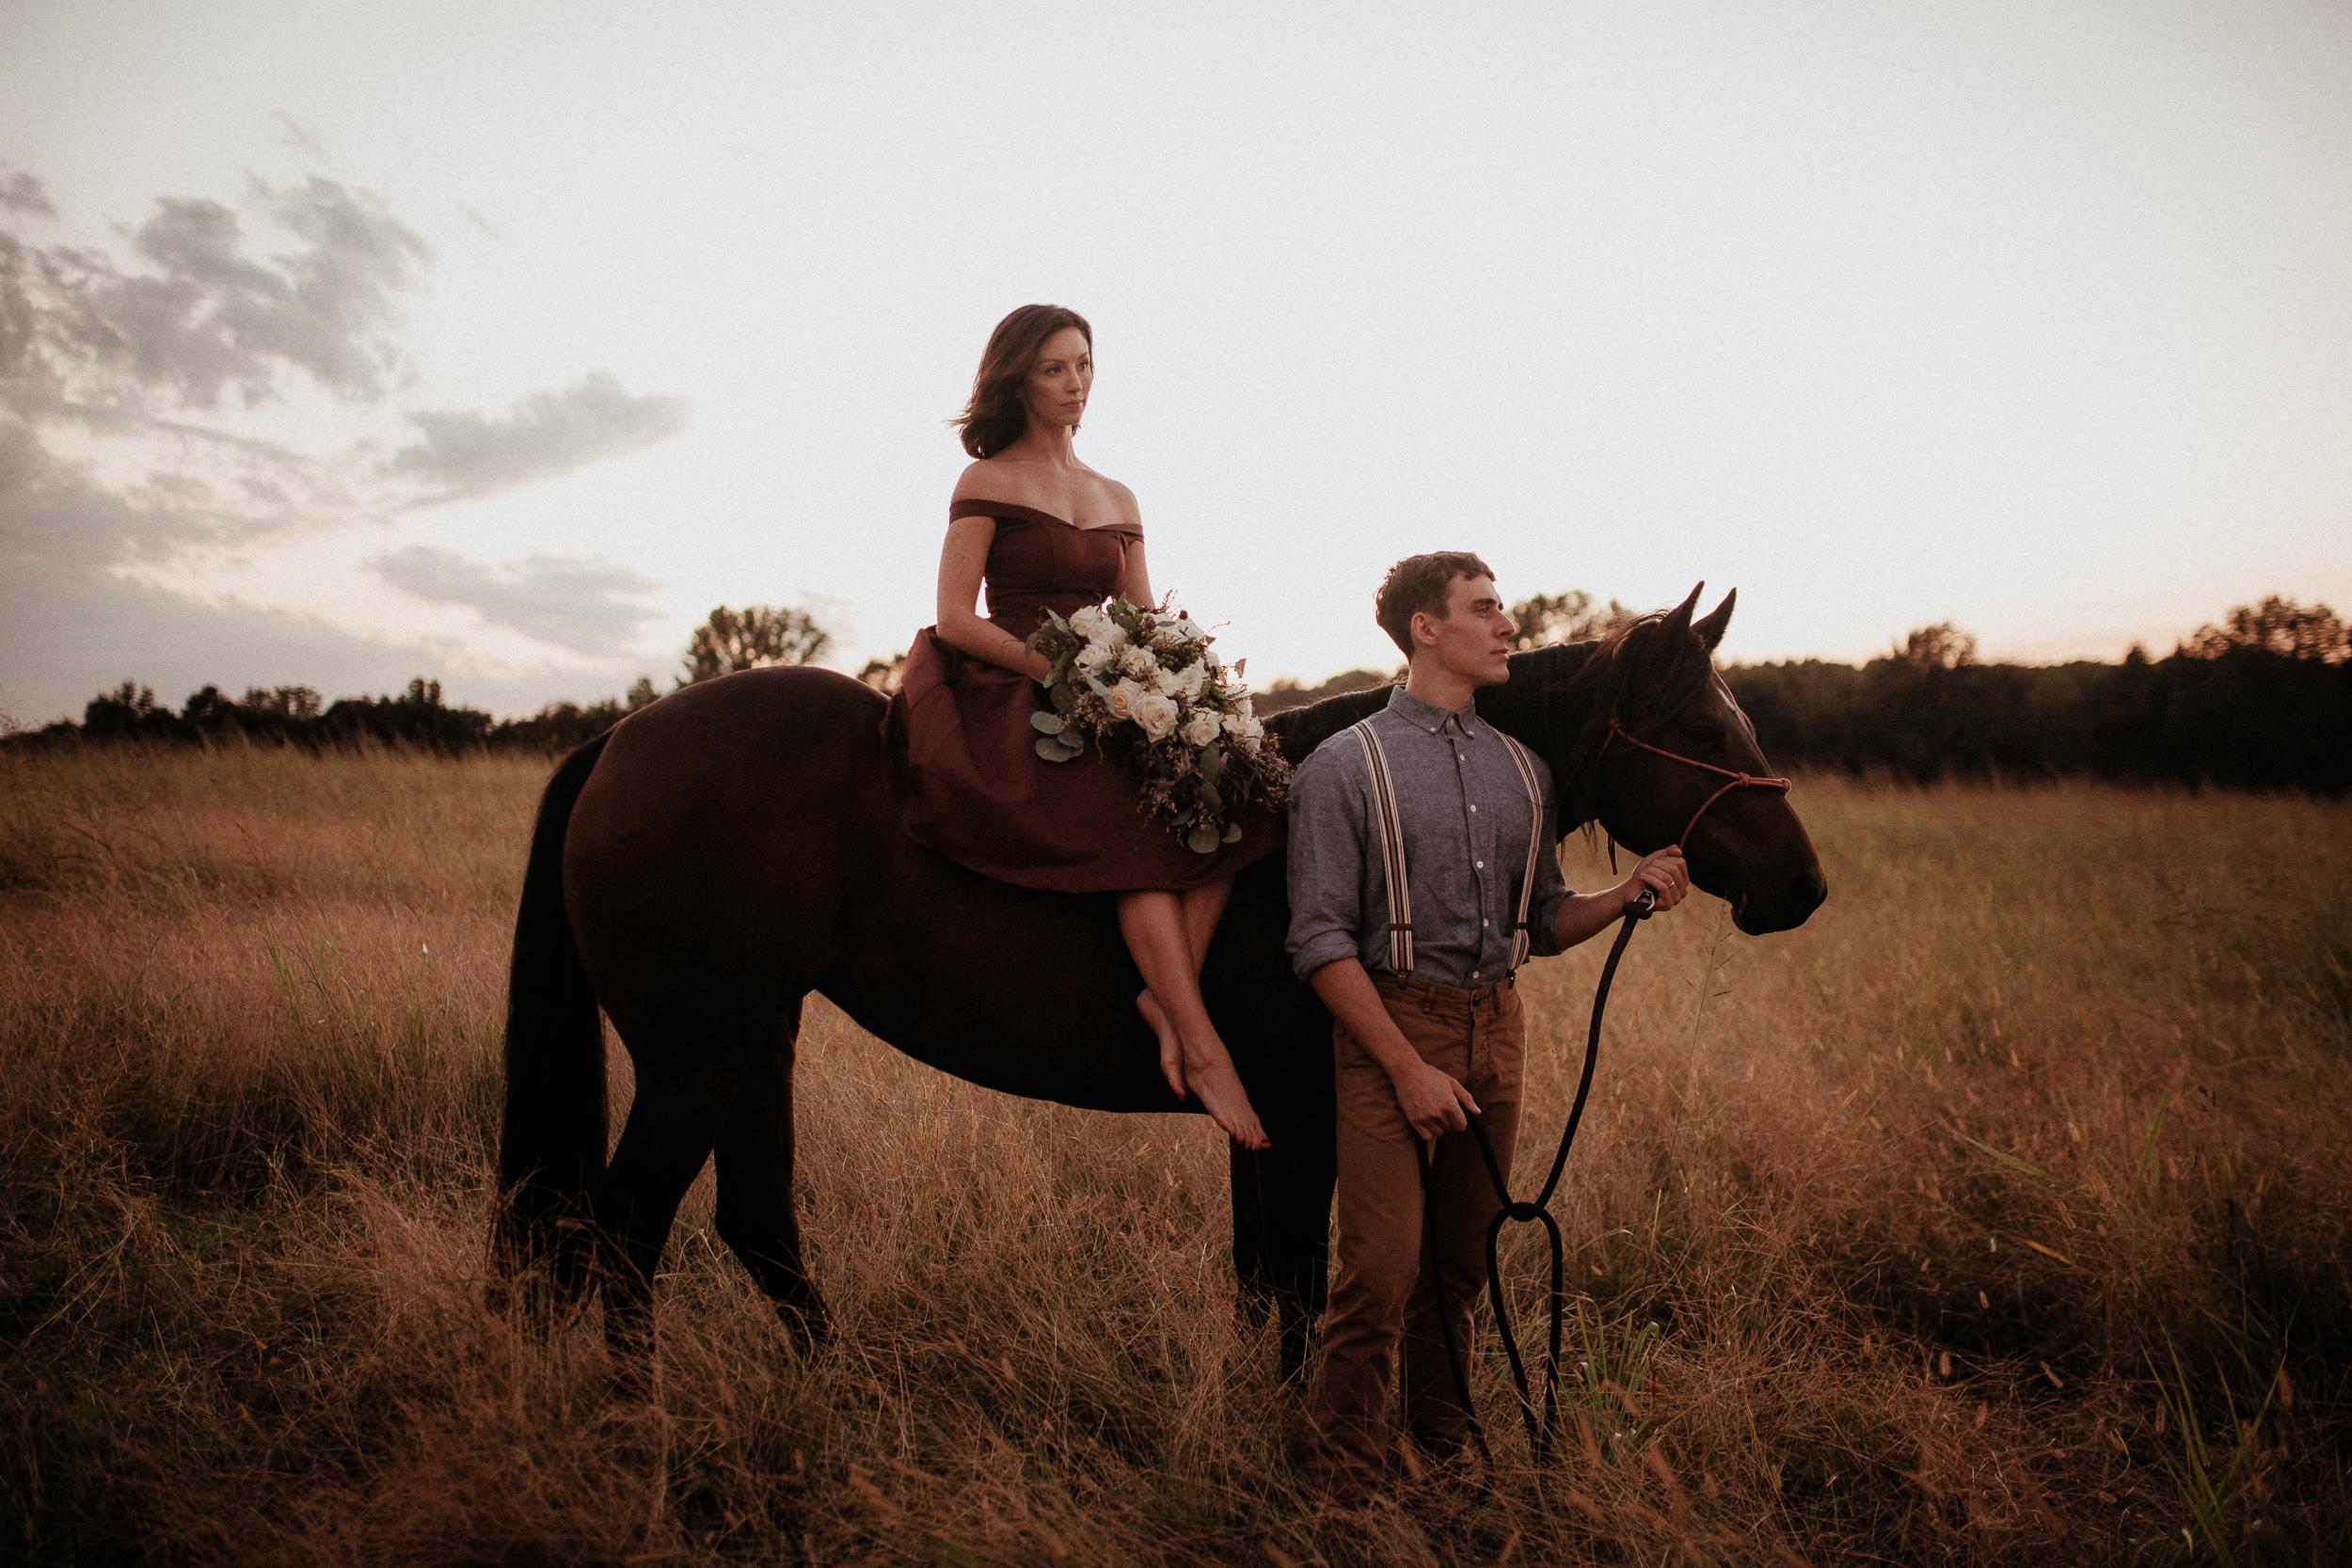 memphis-gatlinburg-nashville-tennessee-wedding-photographer-the-hatches-utah-colorado-washington-arizona-oregon-yosemite-national-park-elopement-adventure-emotional-journalistic-bohemian-florals-minimalistic-winery-elegant-timeless-engagement